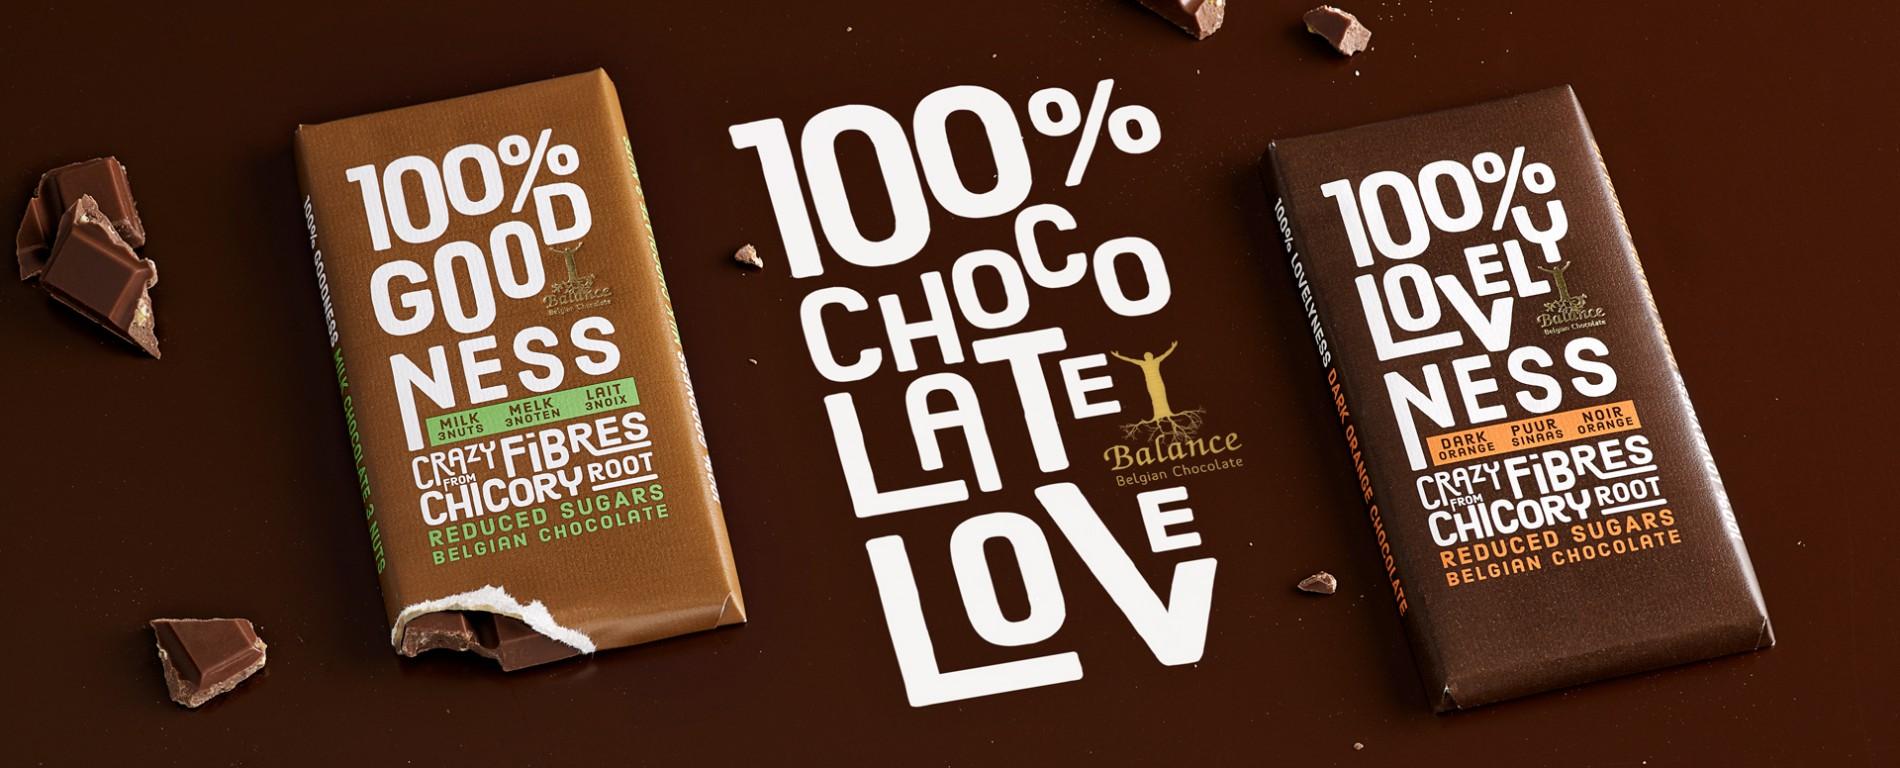 Quatre Mains package design - Package design klingele, pureness, chocolate, balance, quatre mains